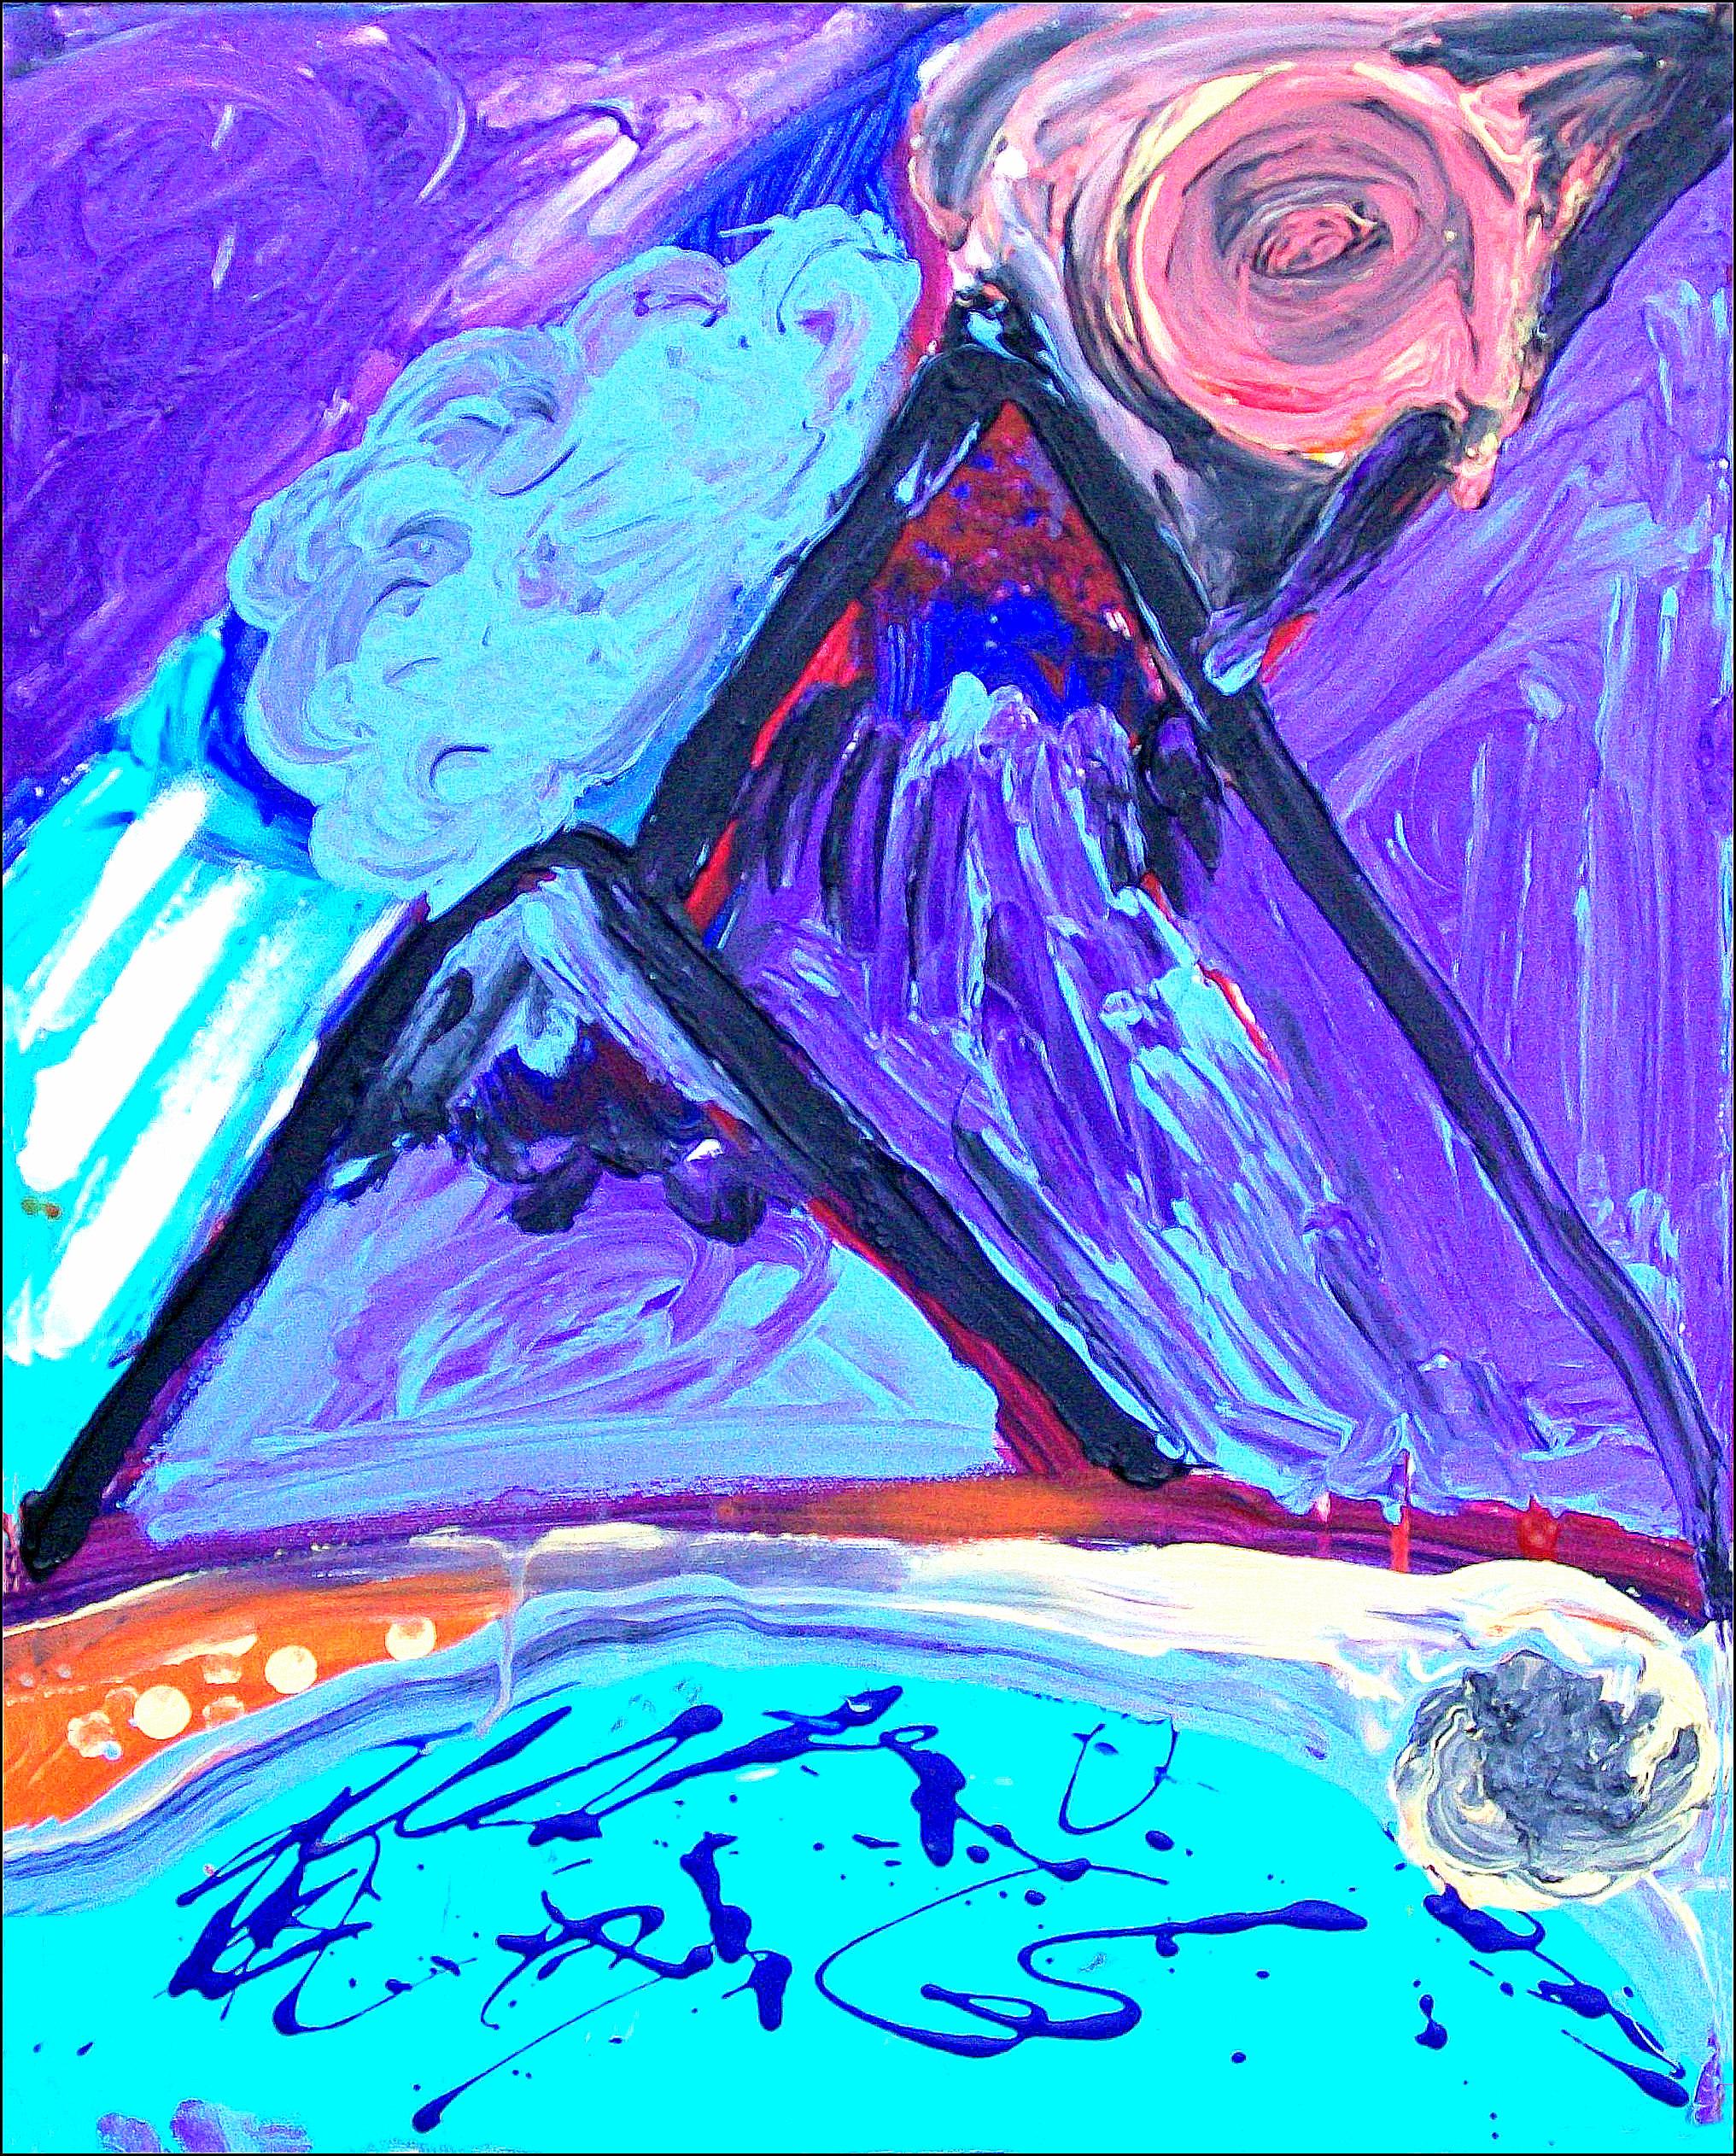 Purple Mountains Rachael Alhassen 2012 Acrylic on Canvas, Photo Print $35